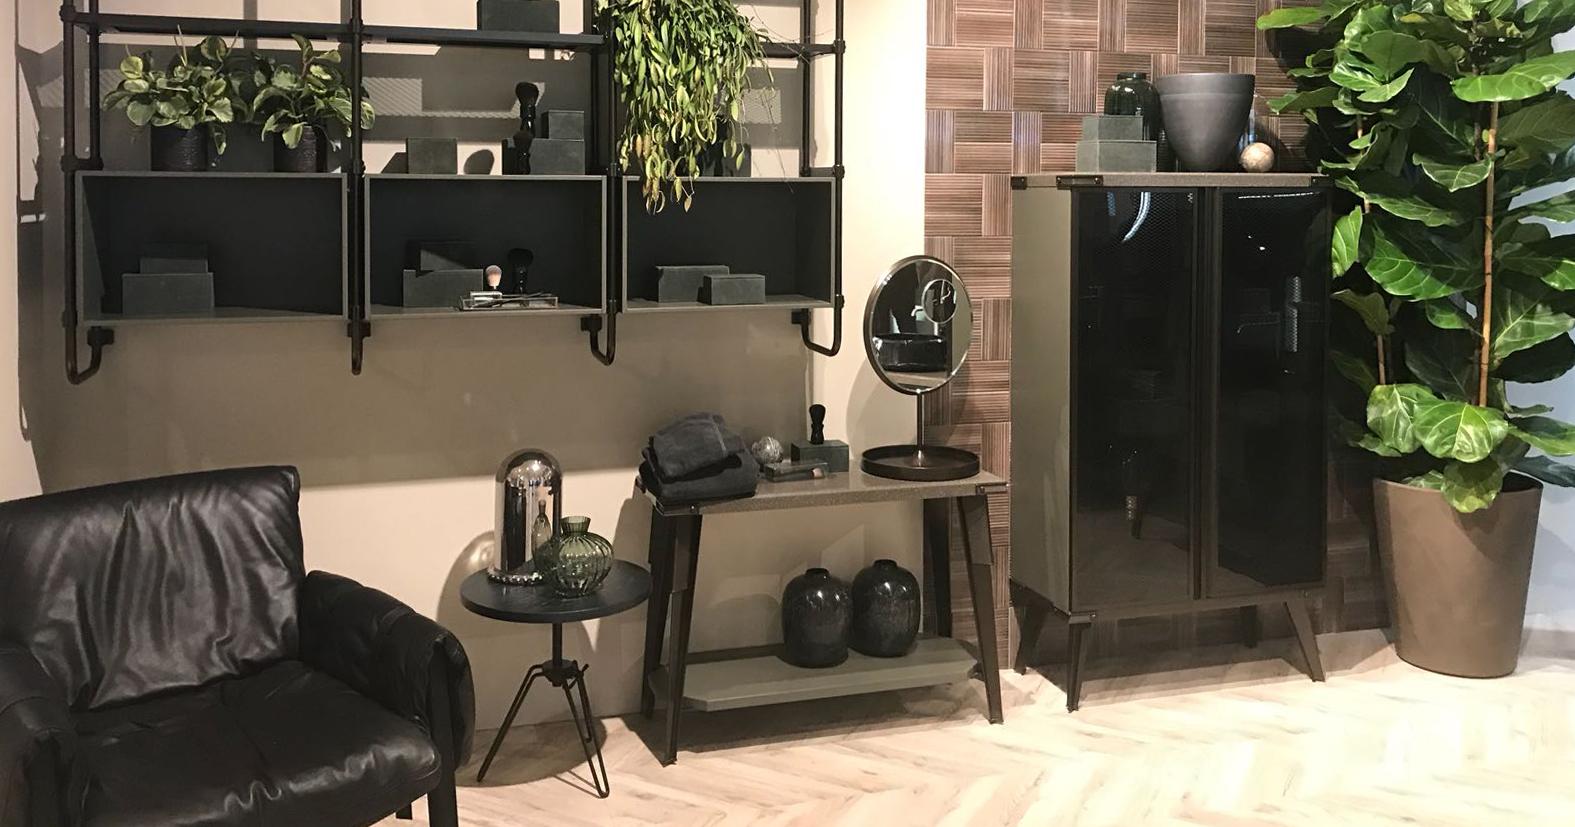 Cersaie-2018-Bologna-arredobagno-pavimenti-addessi-design (1)